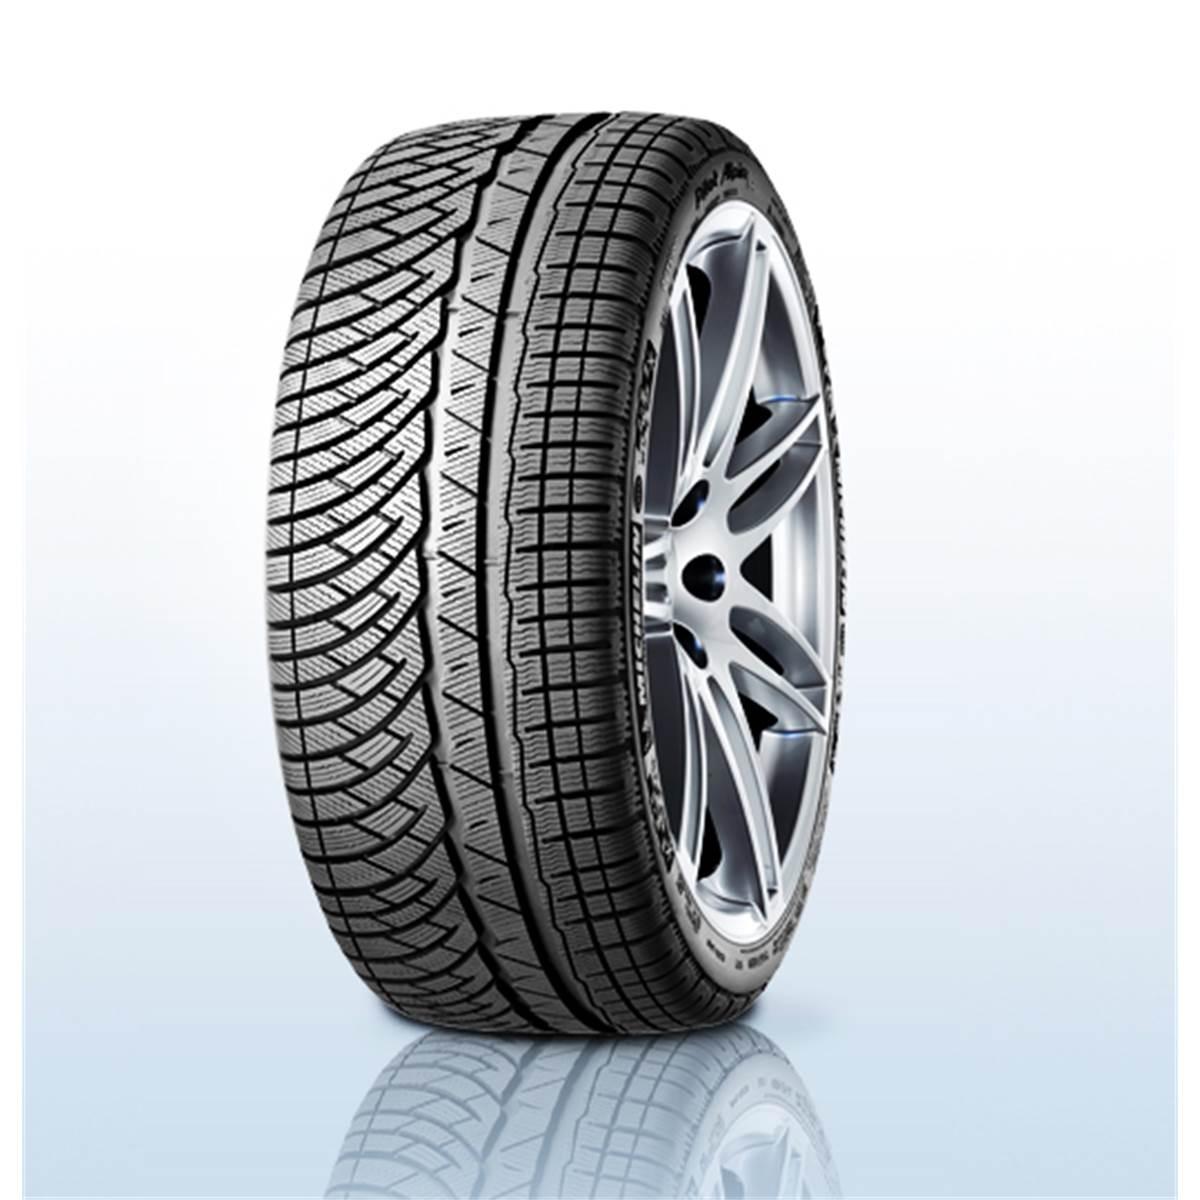 Pneu Hiver Michelin 285/30R21 100W Pilot Alpin Pa4 XL